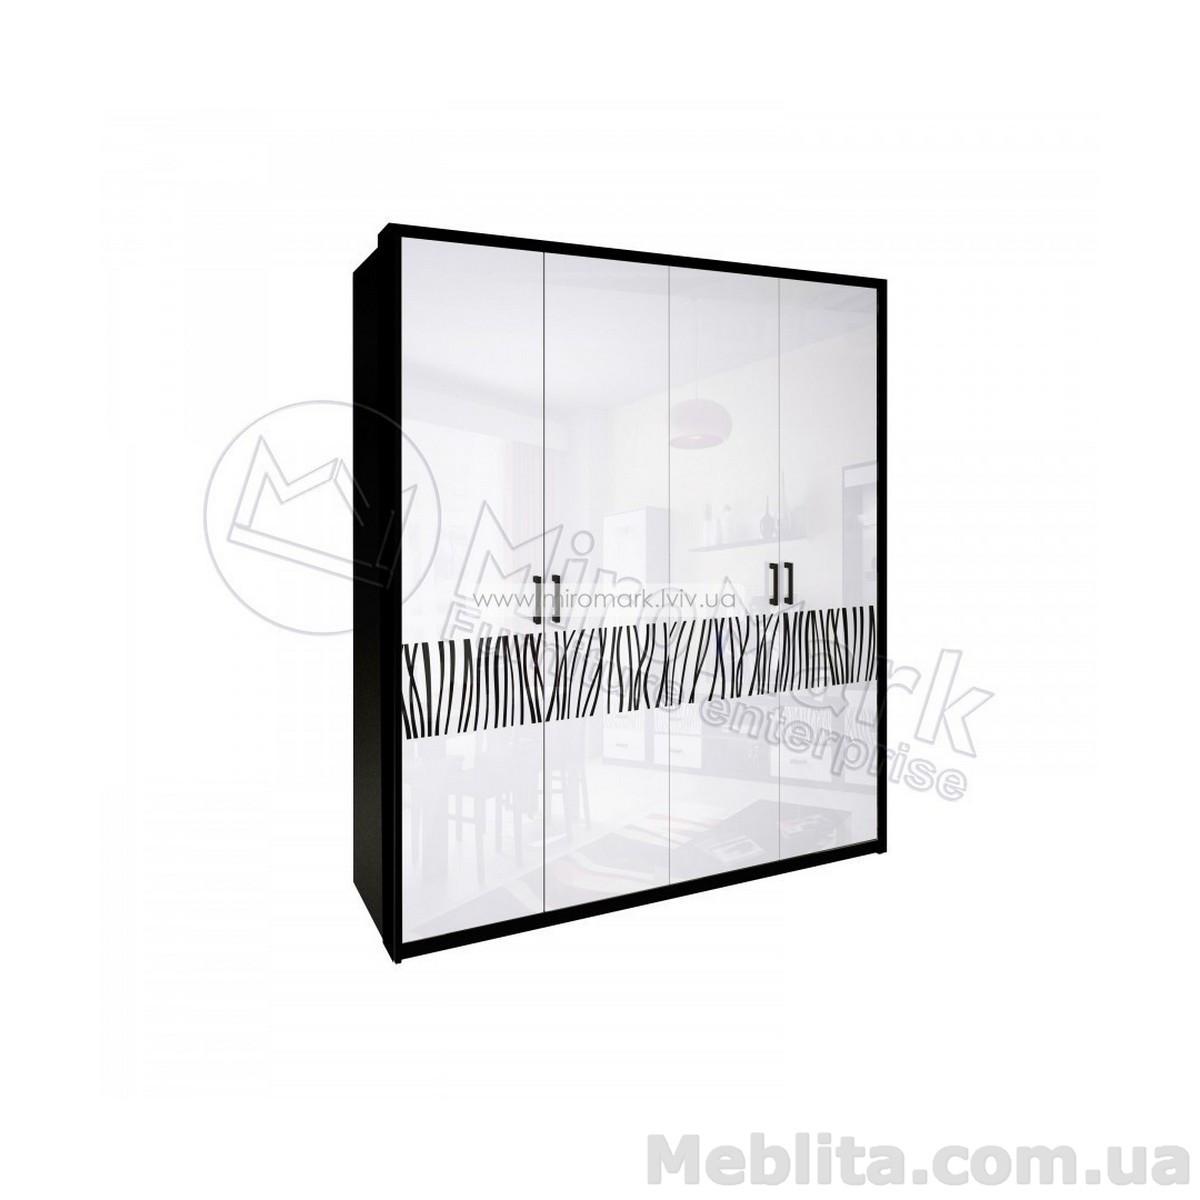 Терра шкаф 4дв без зеркал глянец белый-черный мат